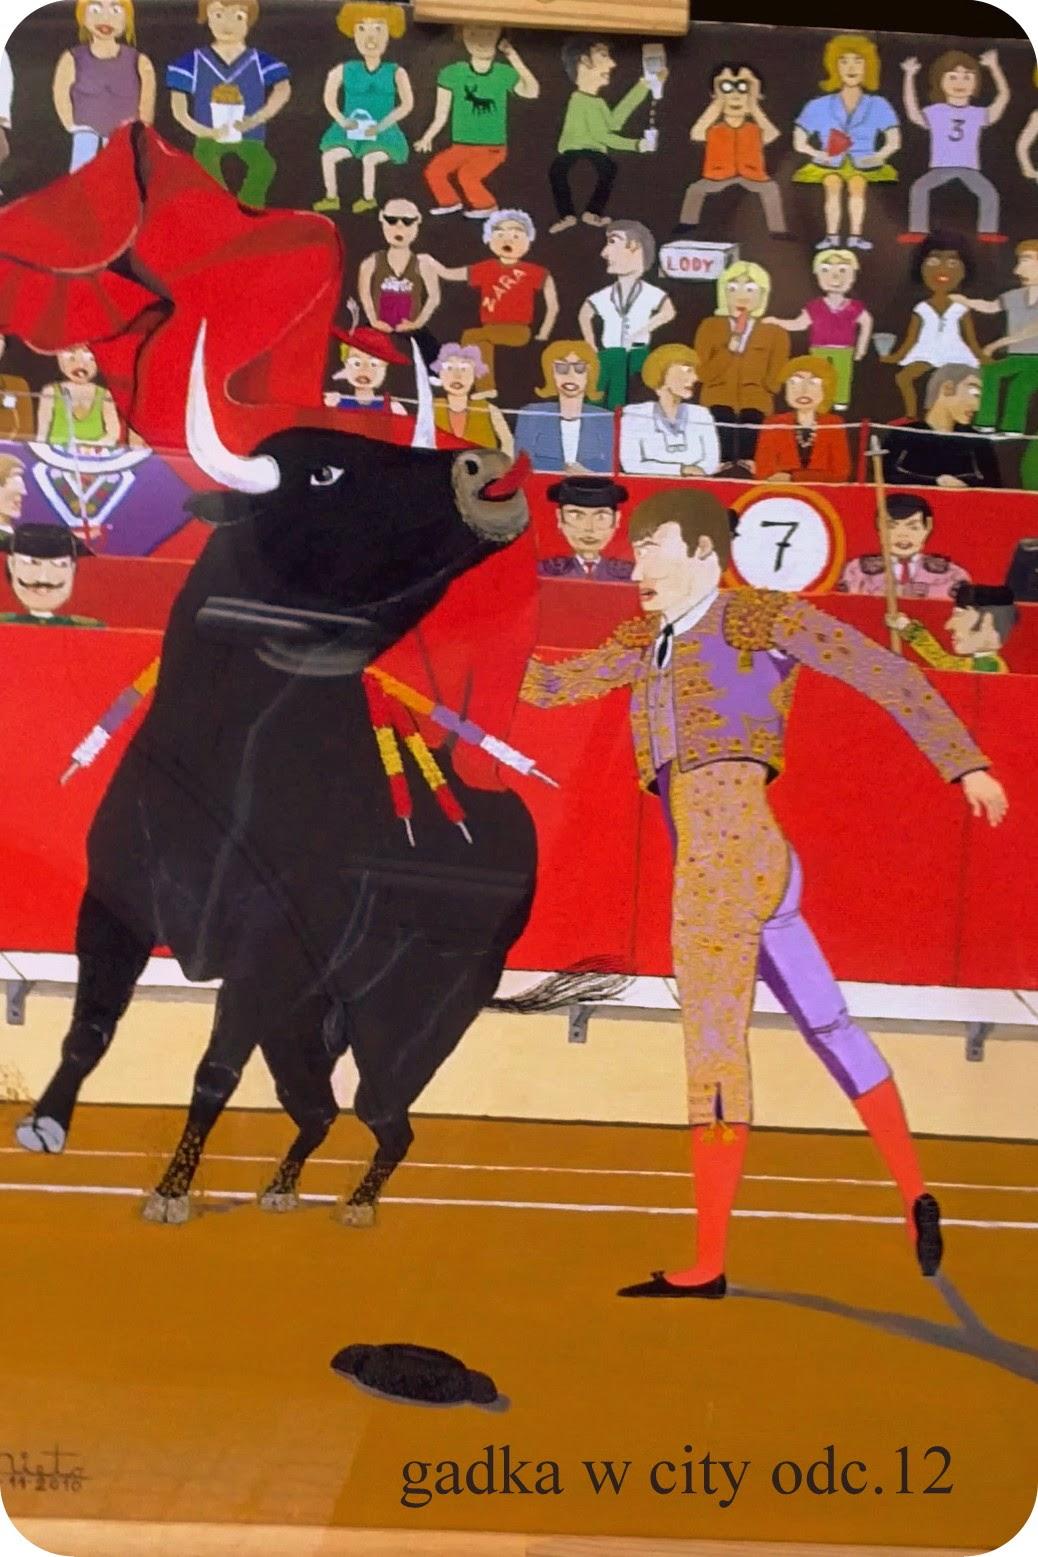 http://gadkaszmatkanabis.blogspot.com/2014/03/gadka-w-city-odc-12-farba-flamenco.html